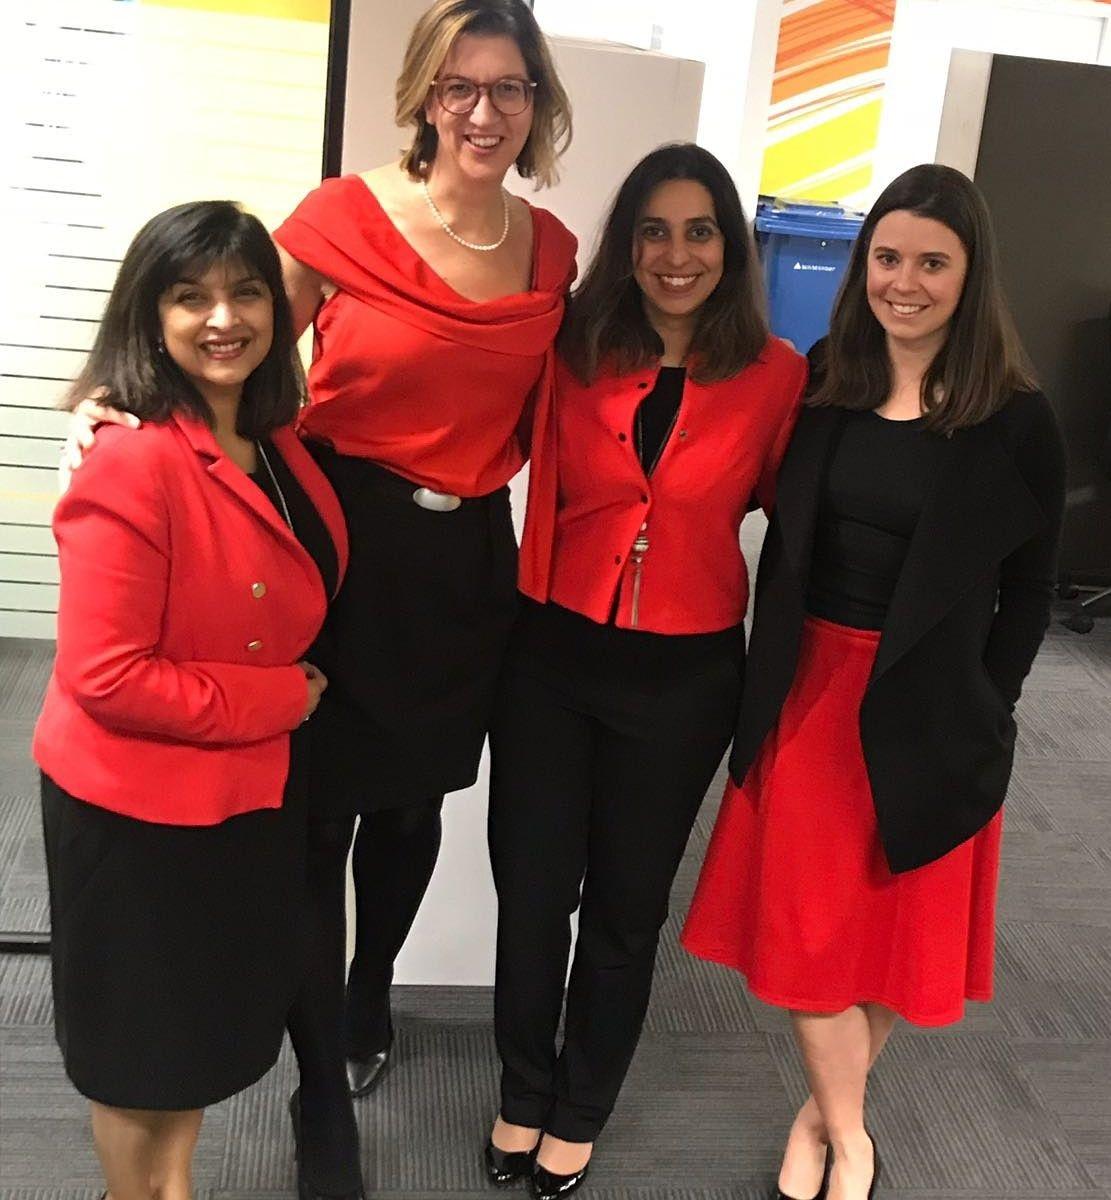 Members of our Women@Capgemini Australia team: Sharon Rode, Barbera Kiefte, Sunainika Saigal and Chloe Sanford.